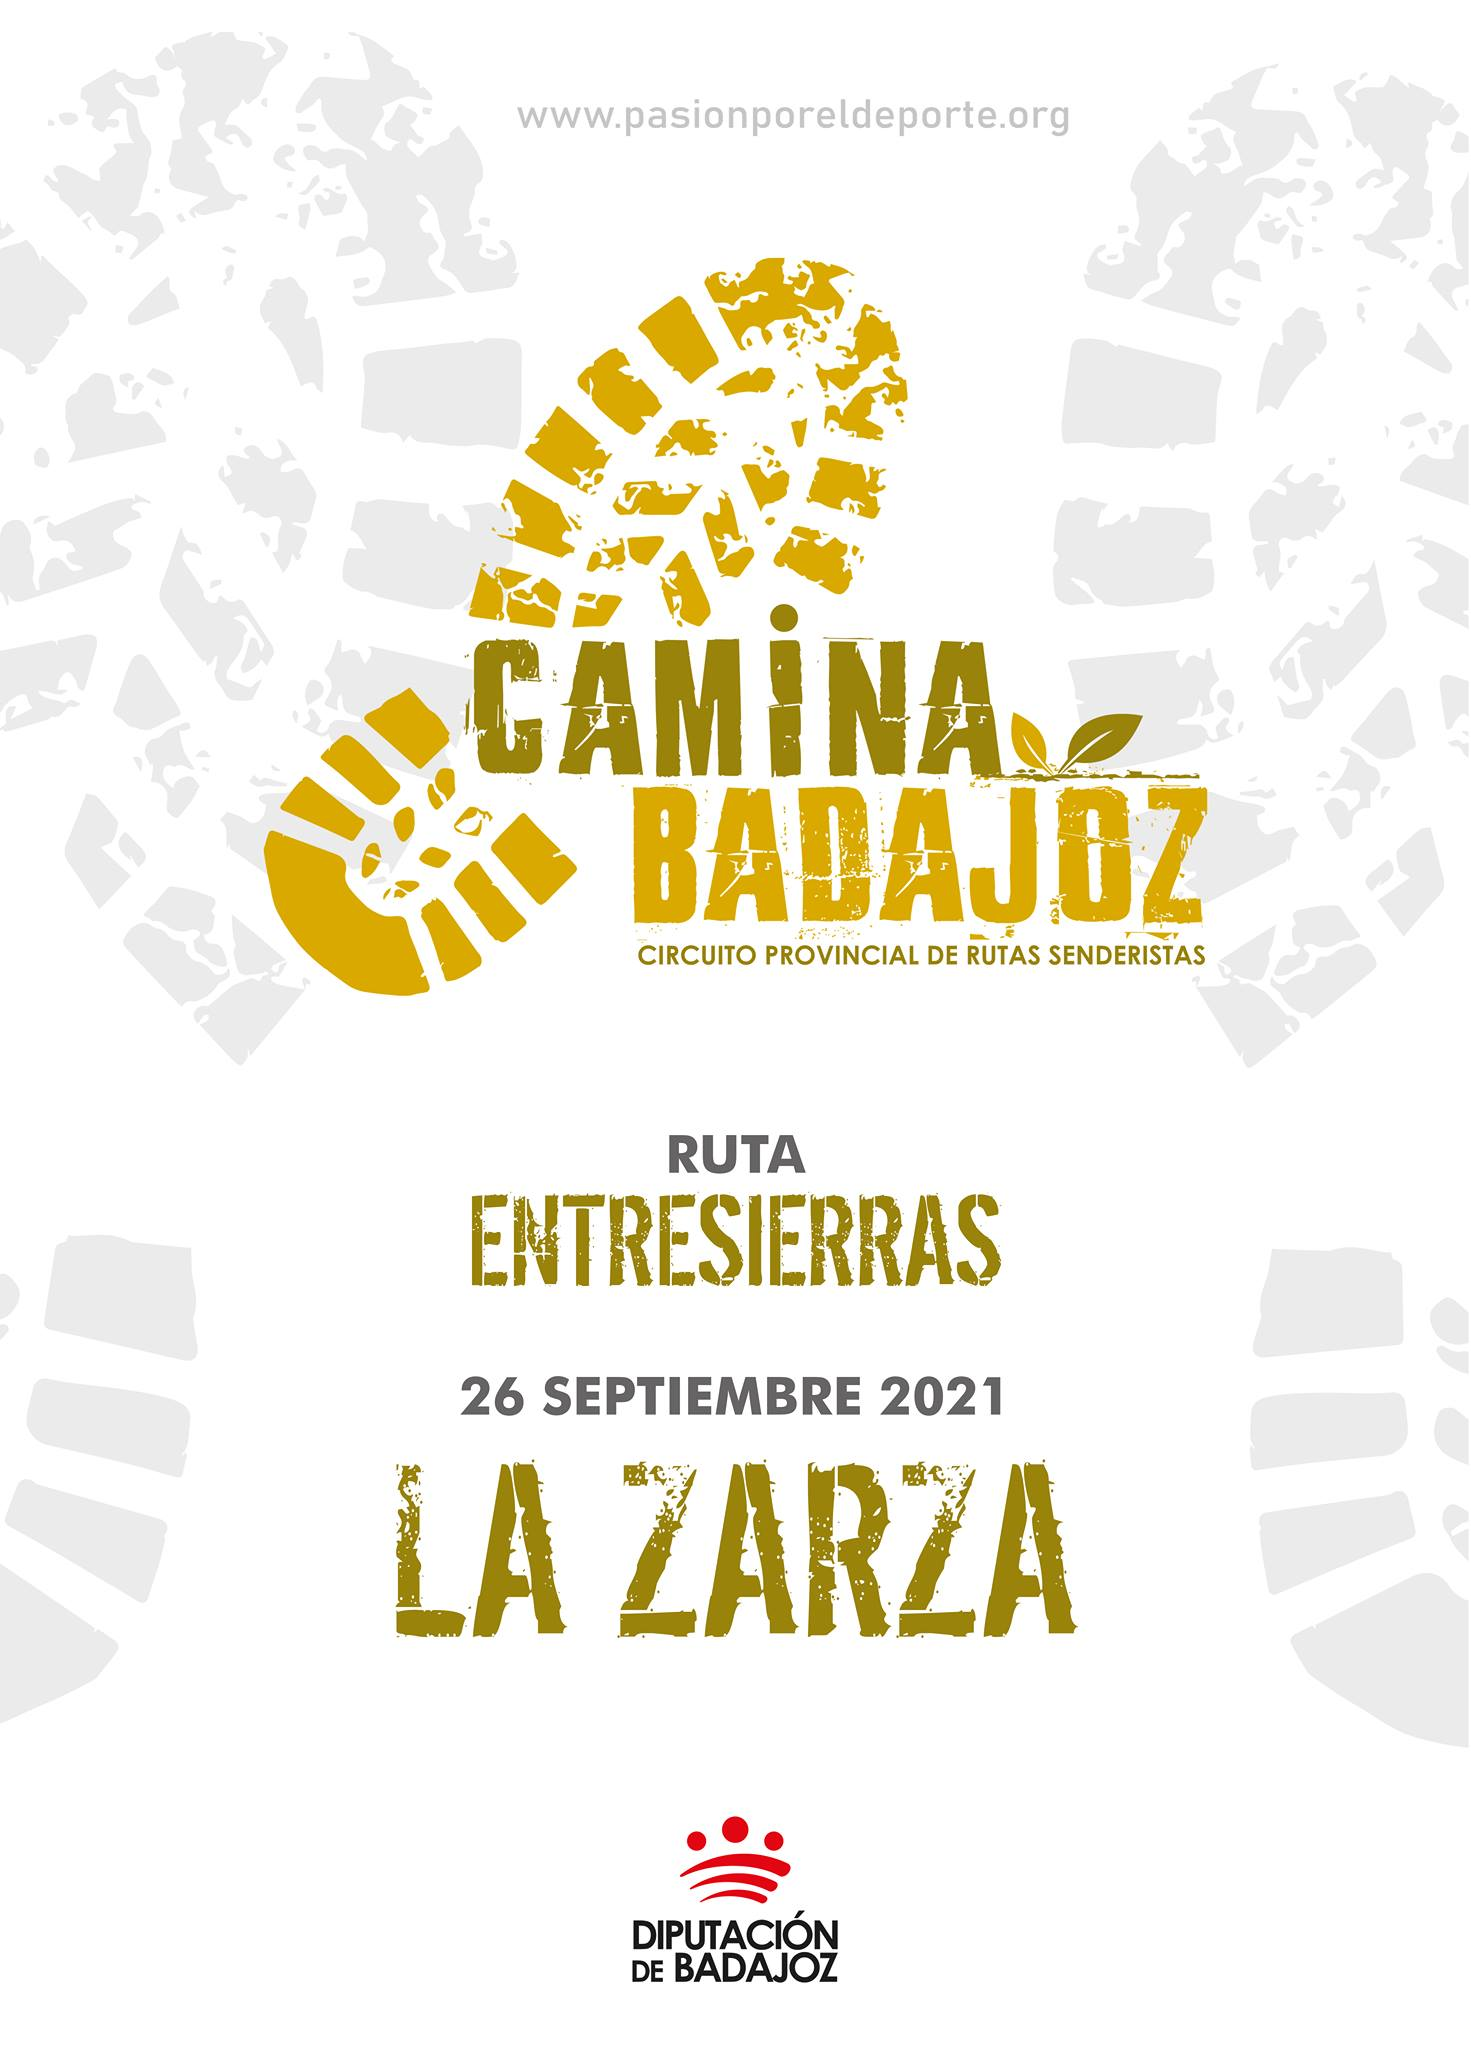 CAMINA BADAJOZ | Ruta entresierras (La Zarza)